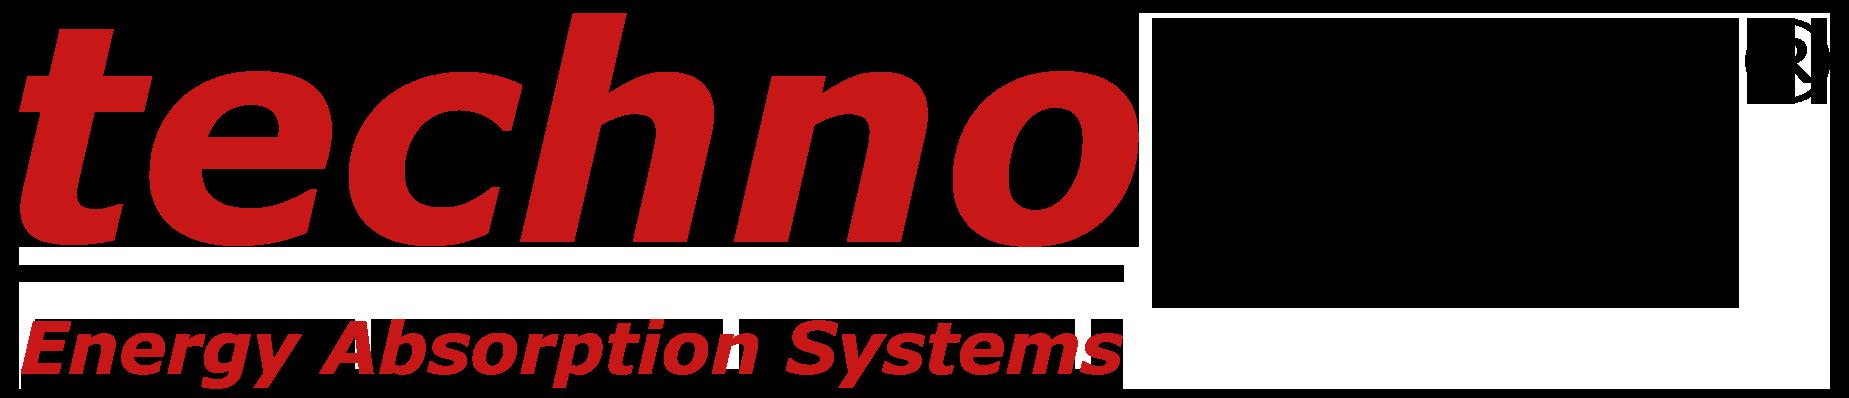 Technogrid Logo EAS.png